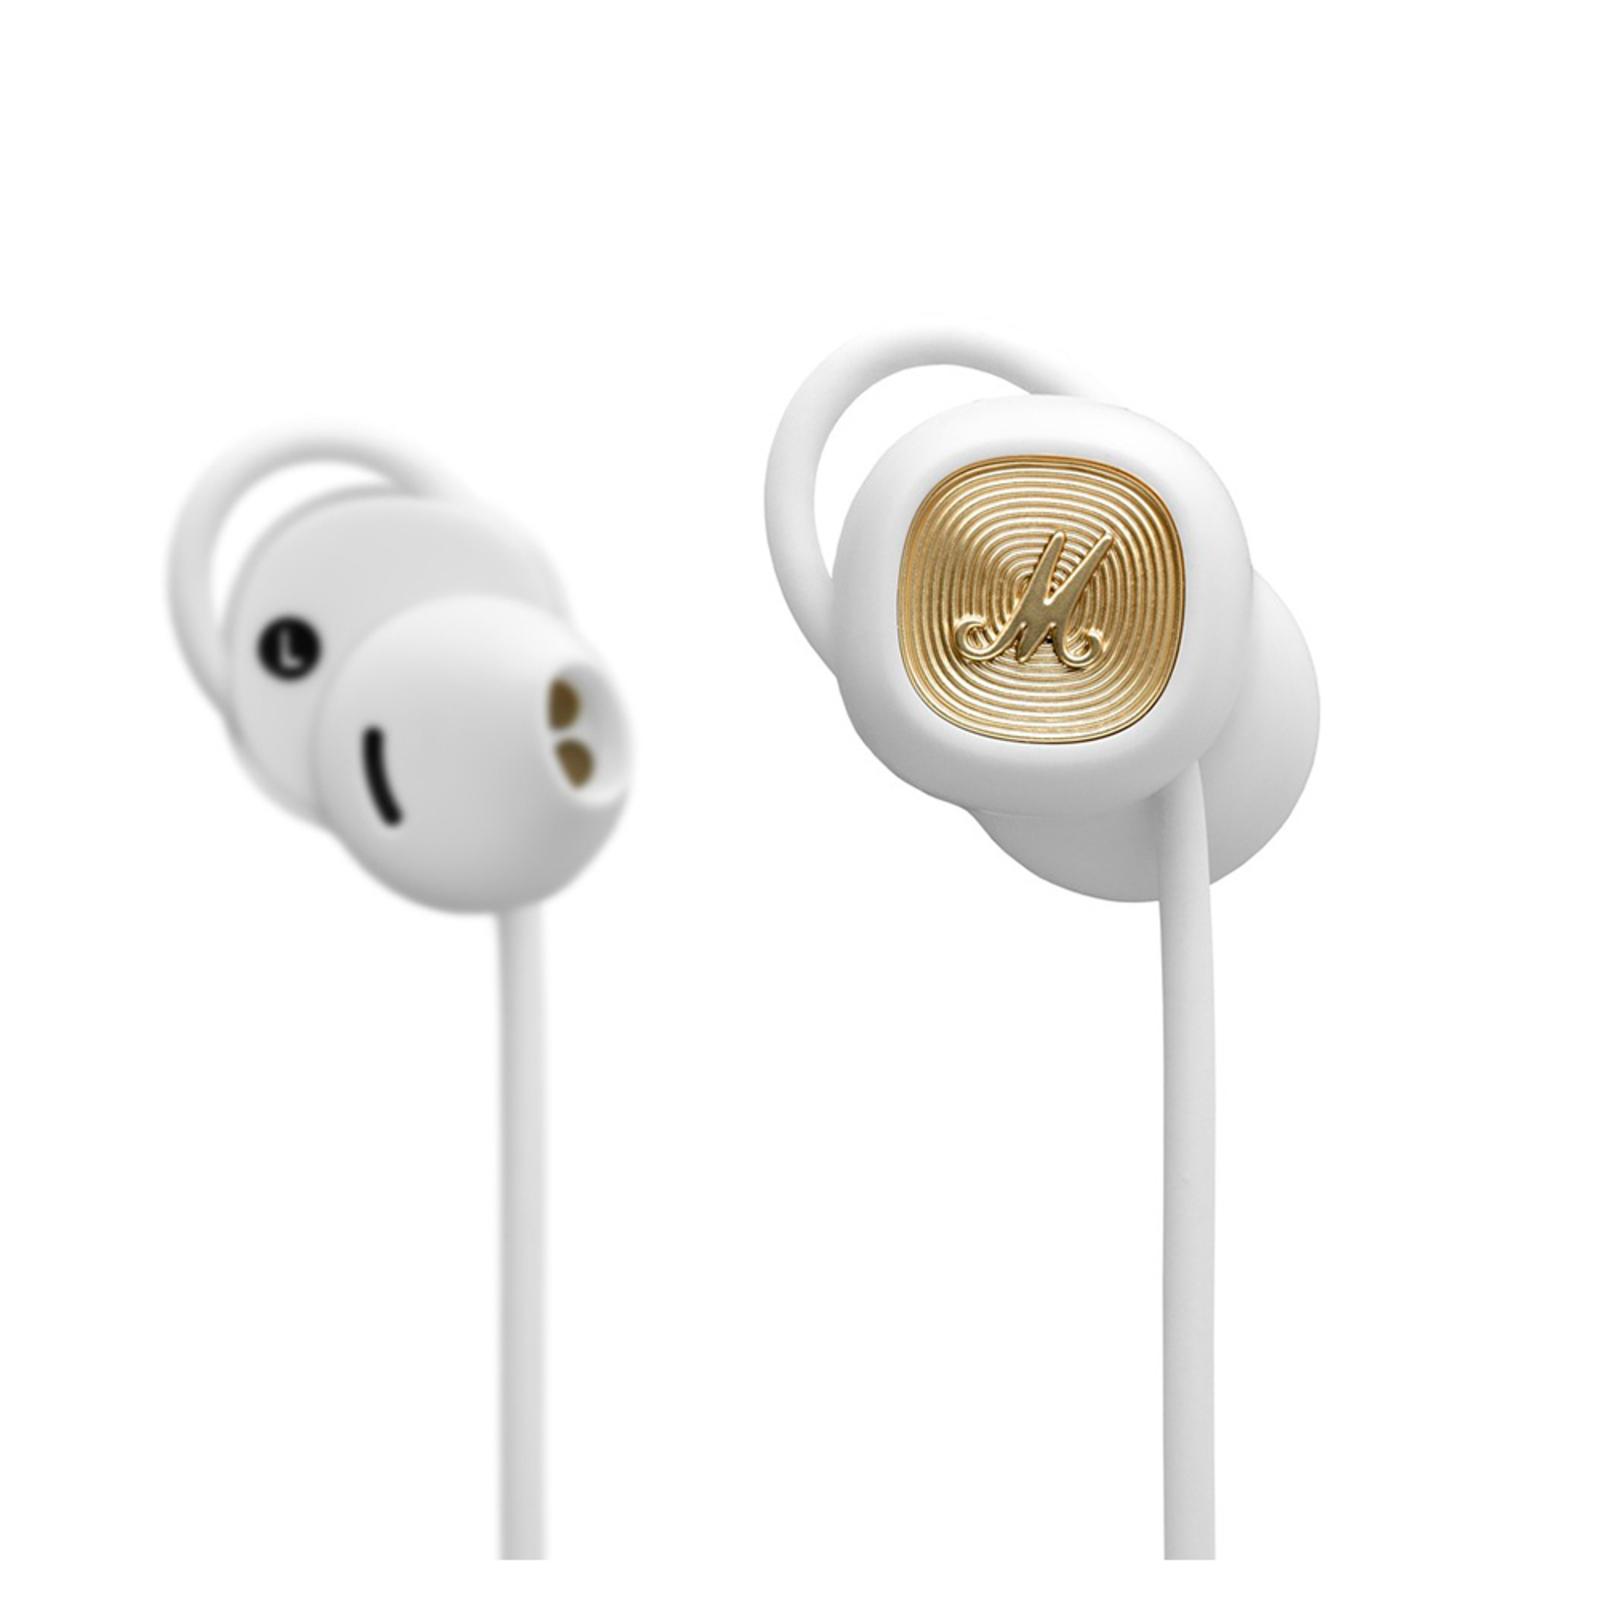 Marshall Minor II BT Wireless Bluetooth 12h Play Time In-Ear Earphones w/Mic WHT